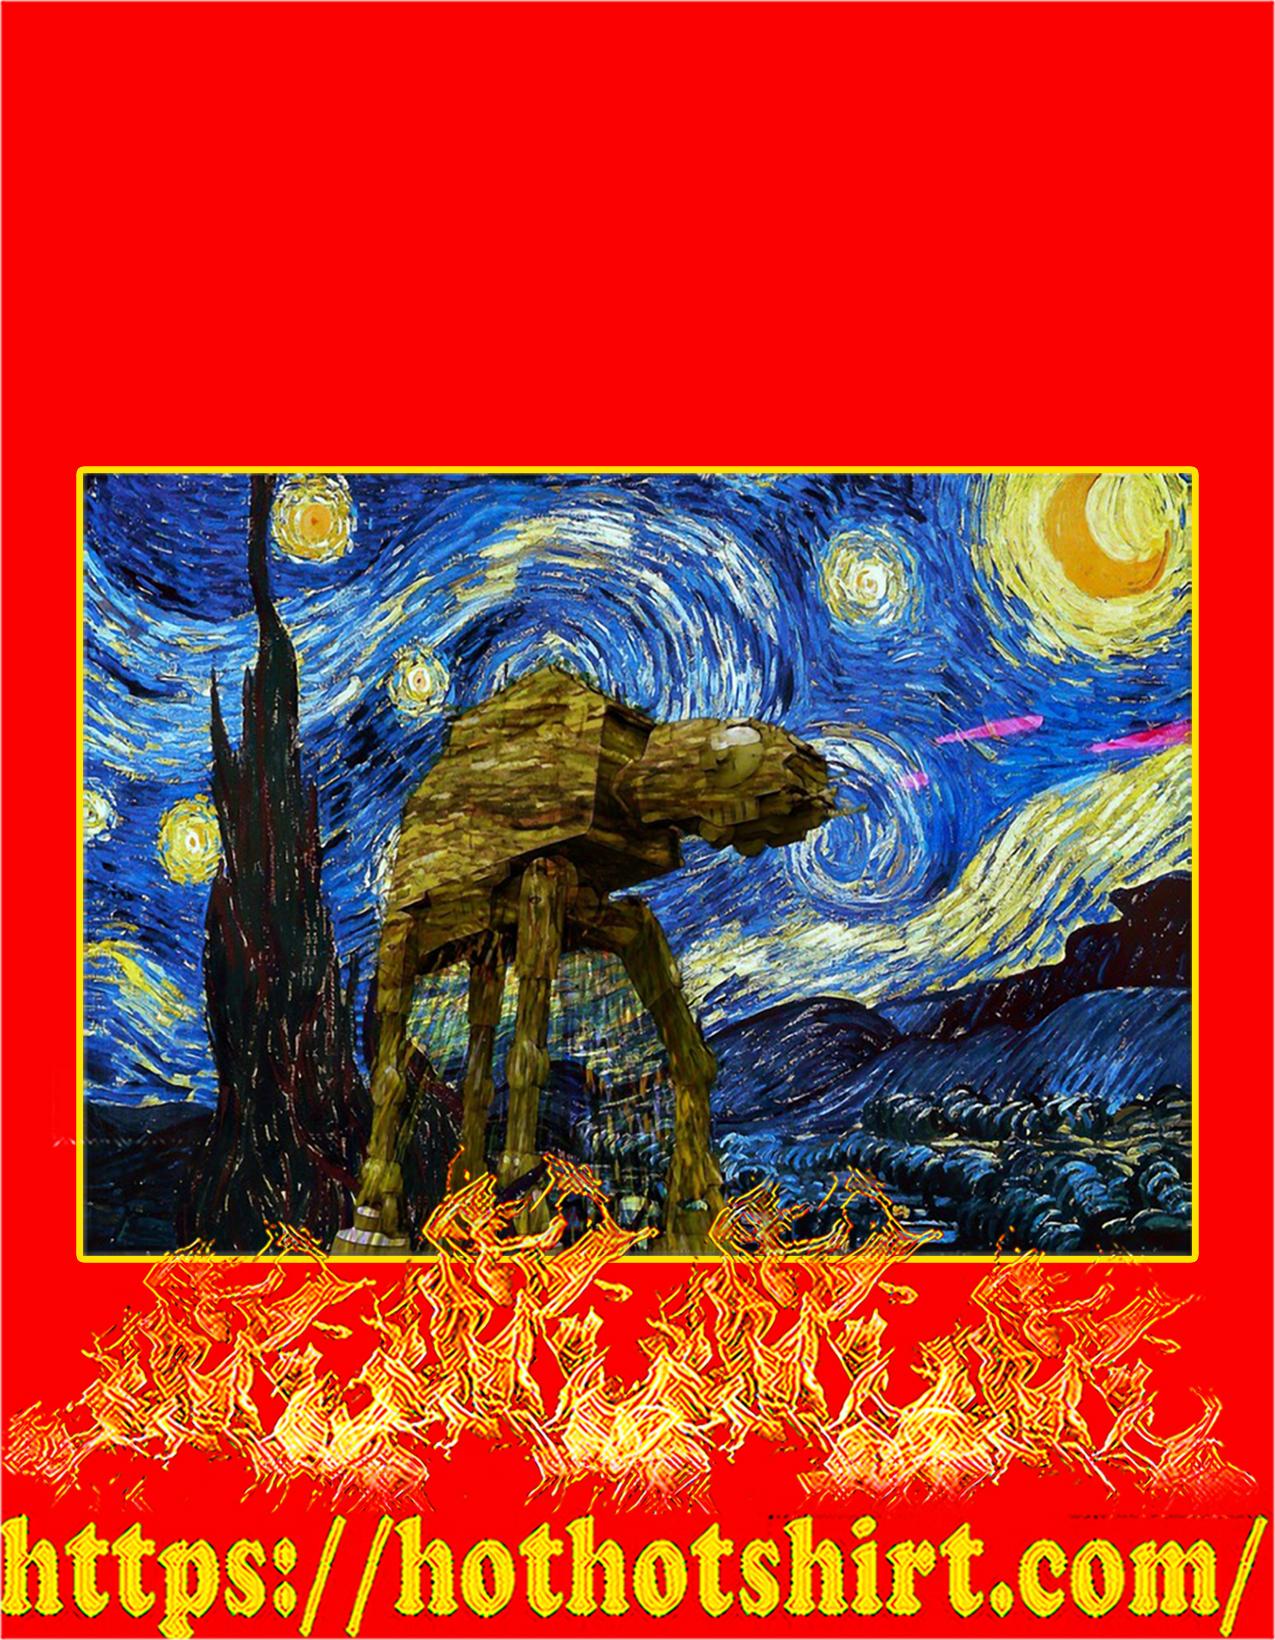 ATAT starry night van gogh poster - A2